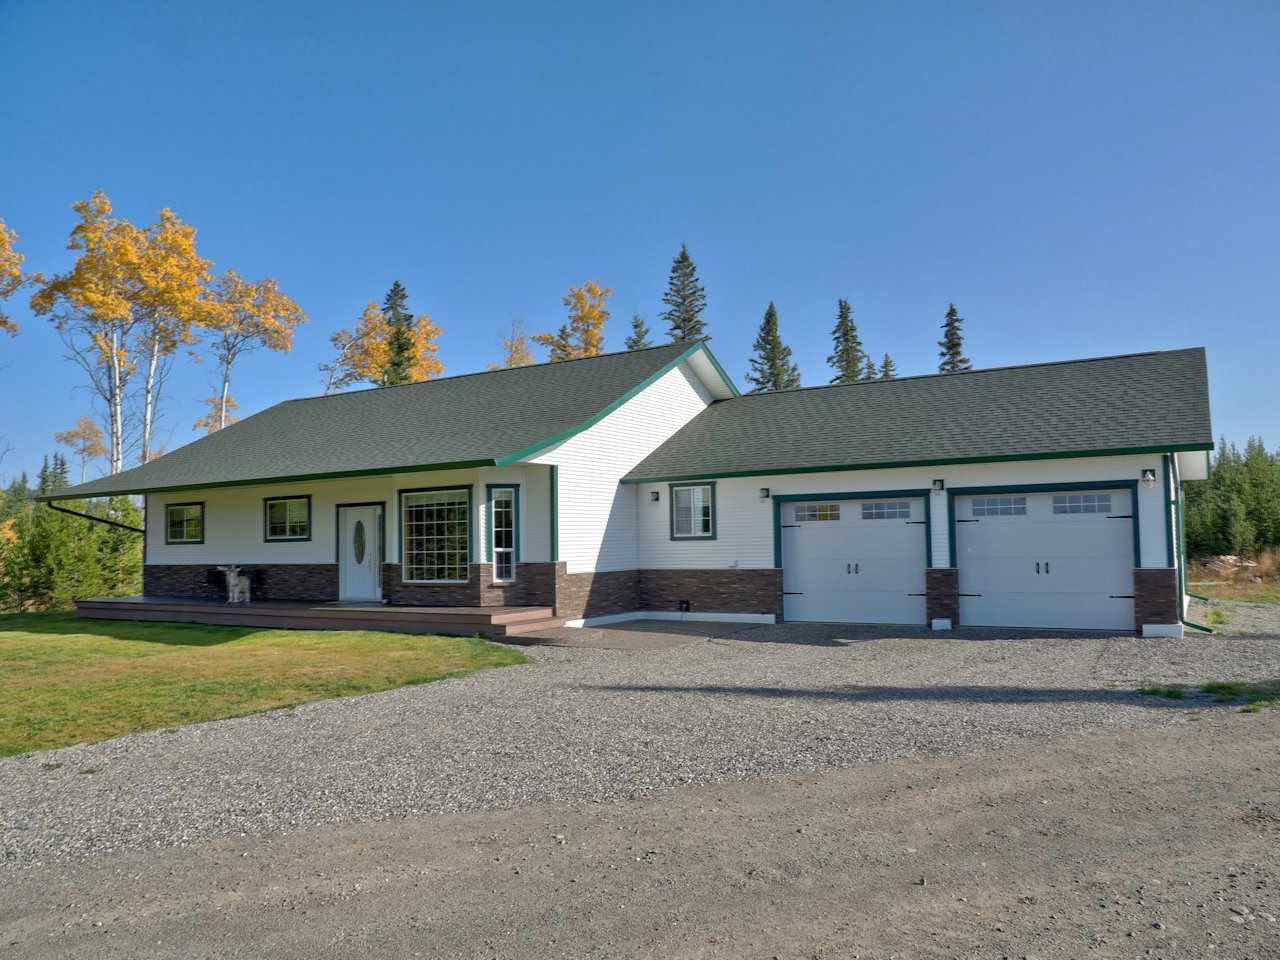 Main Photo: 6292 LITTLE FORT 24 Highway in Bridge Lake: Bridge Lake/Sheridan Lake House for sale (100 Mile House (Zone 10))  : MLS®# R2500372